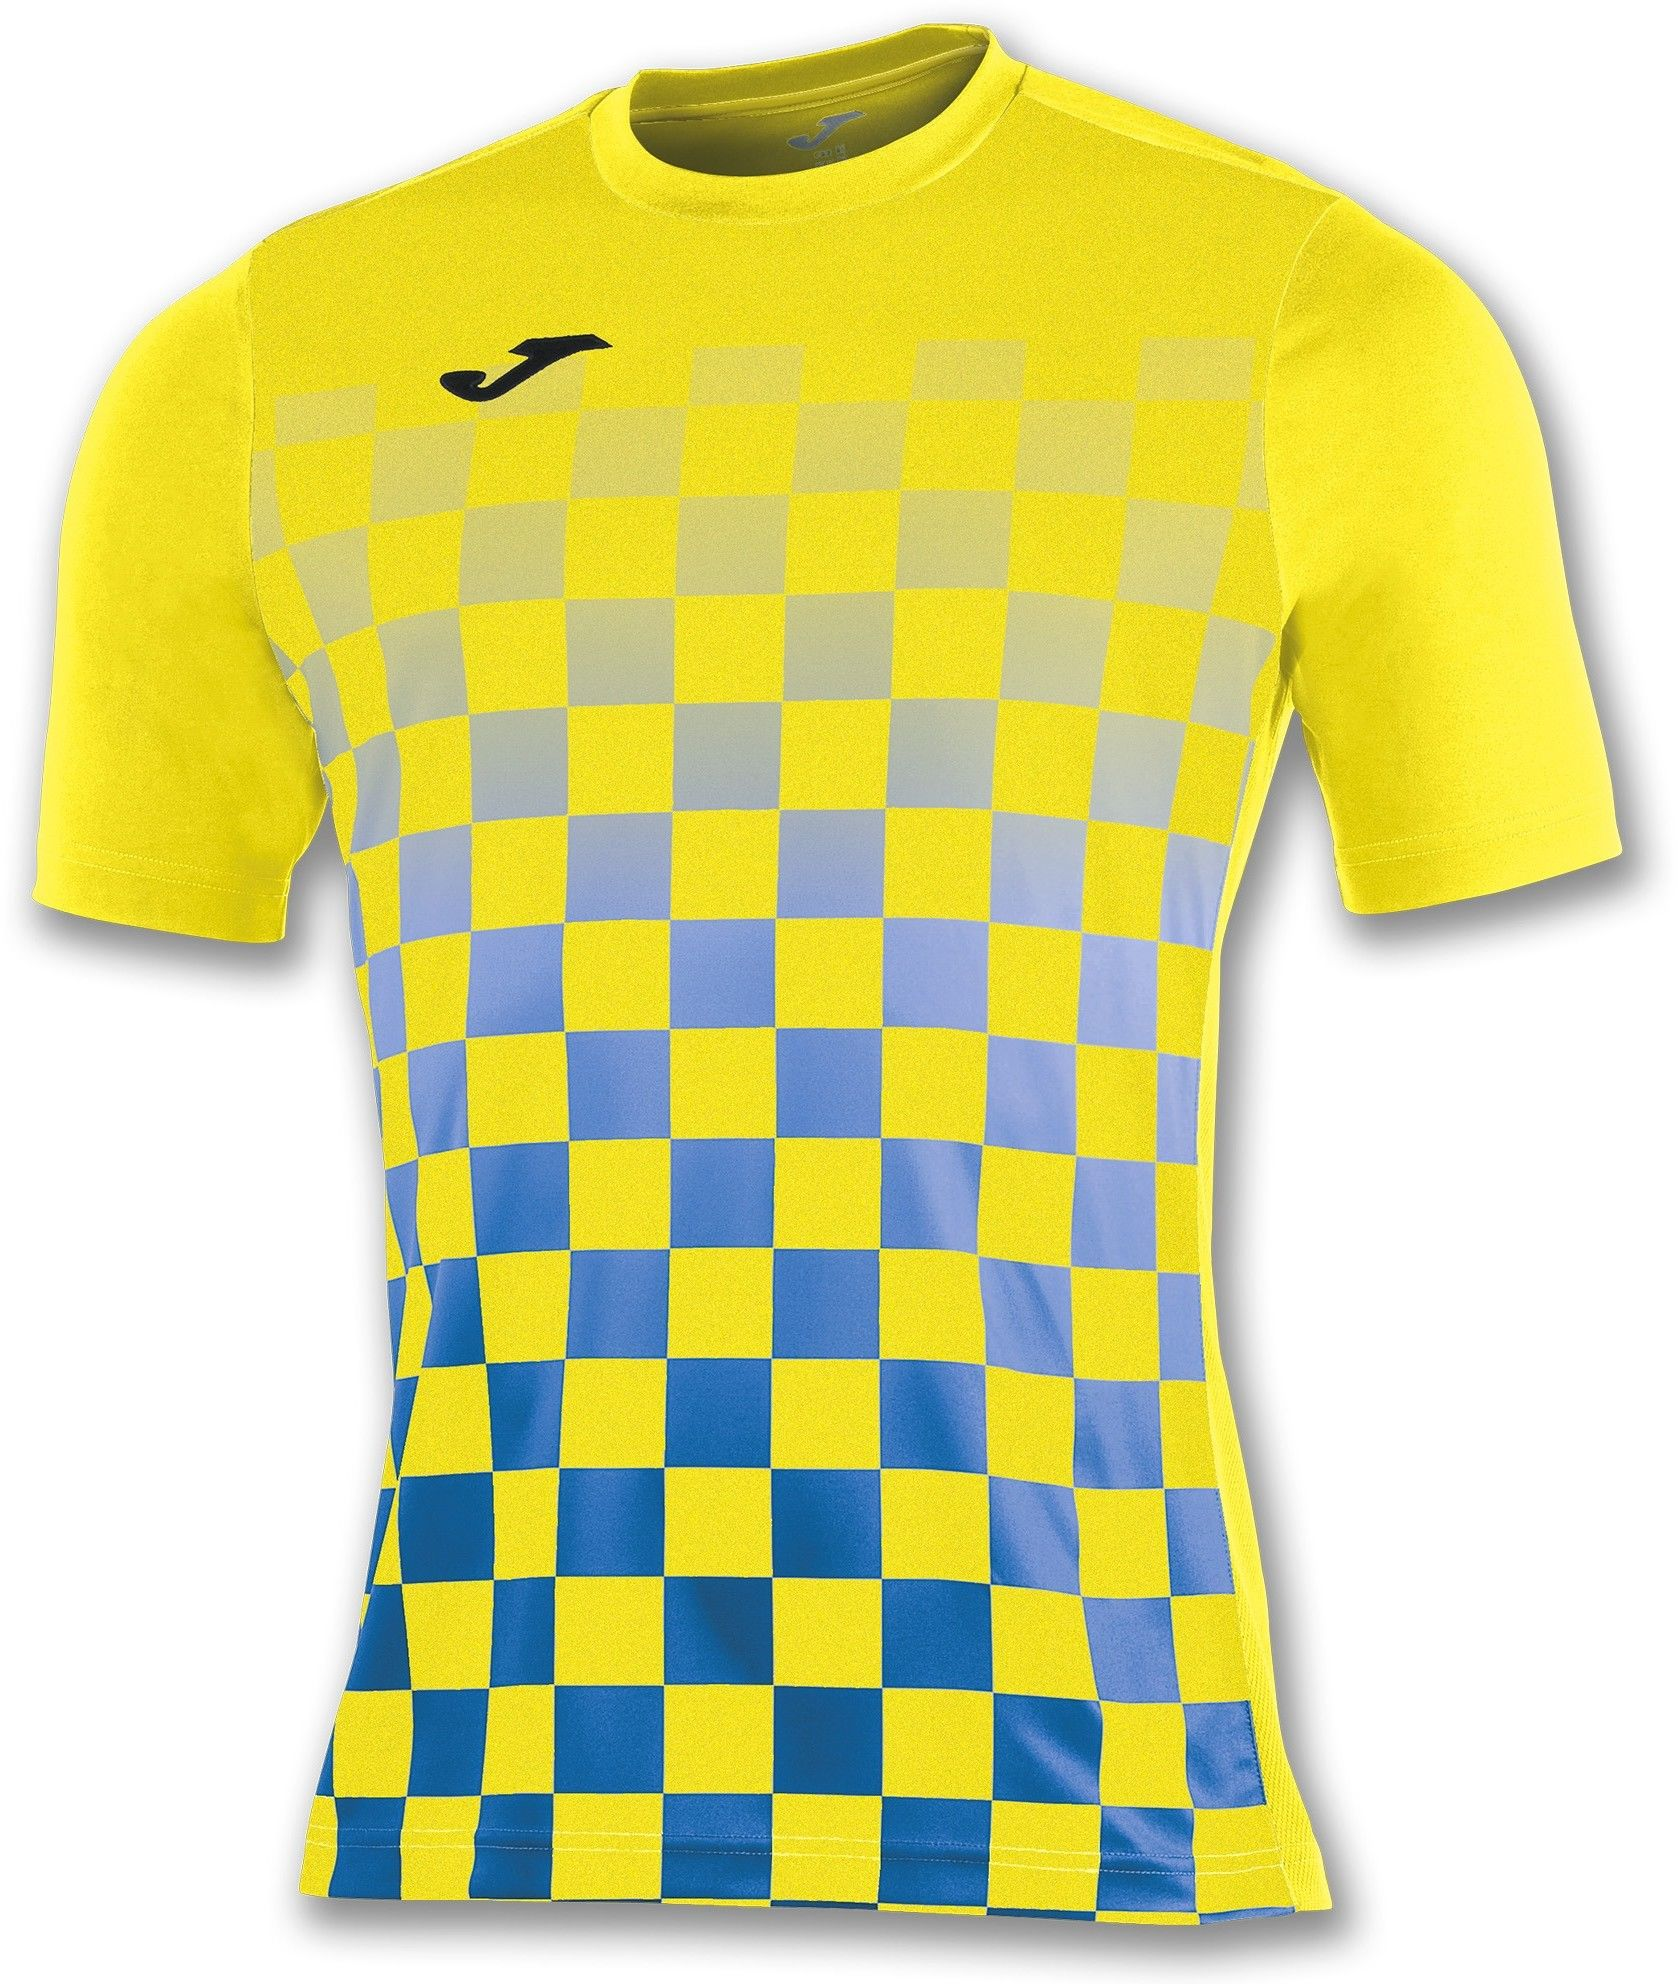 Koszulki Joma Flag yellow/royal (10 szt.)